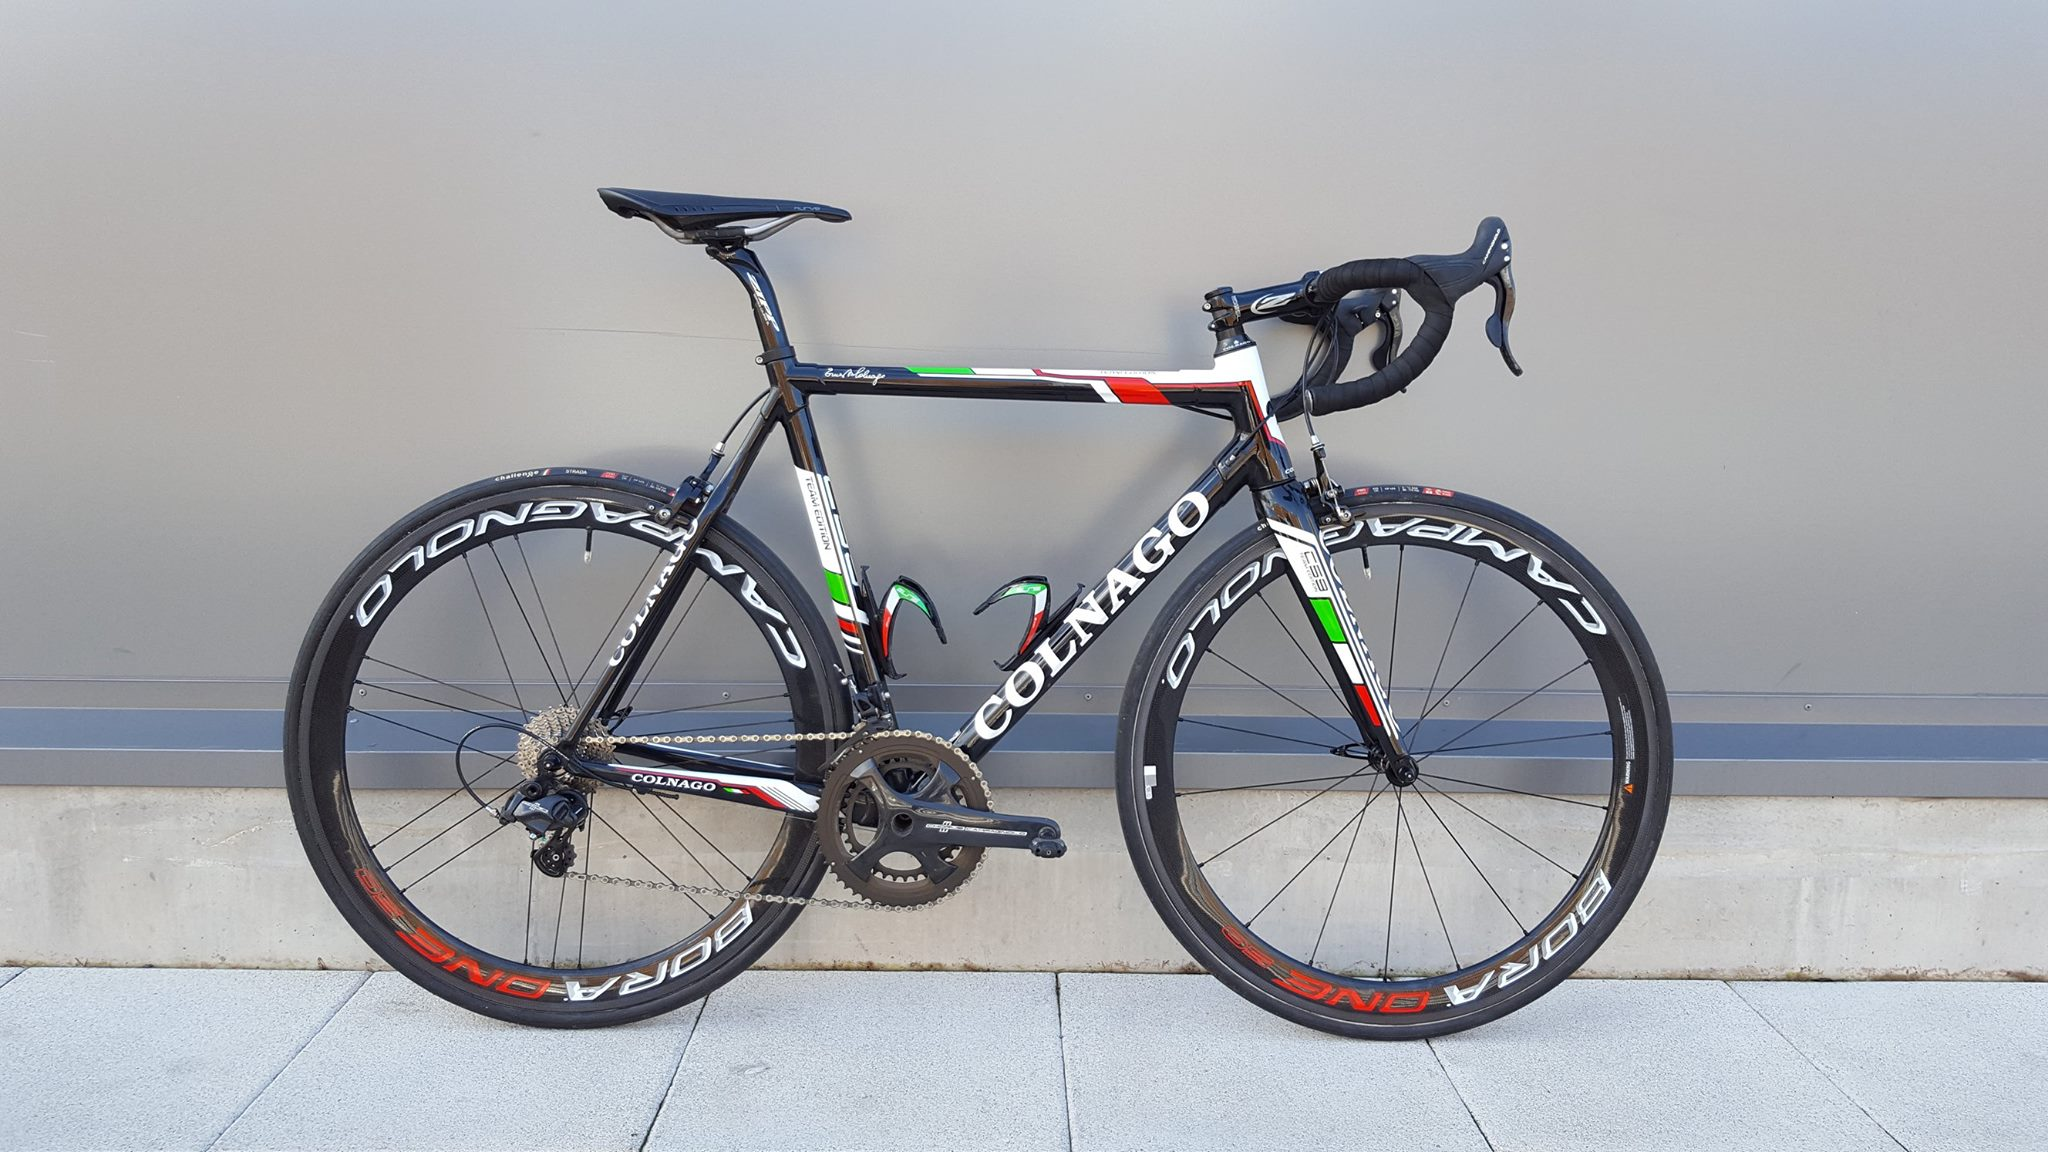 Colnago C59 with Campagnolo Bora One wheels